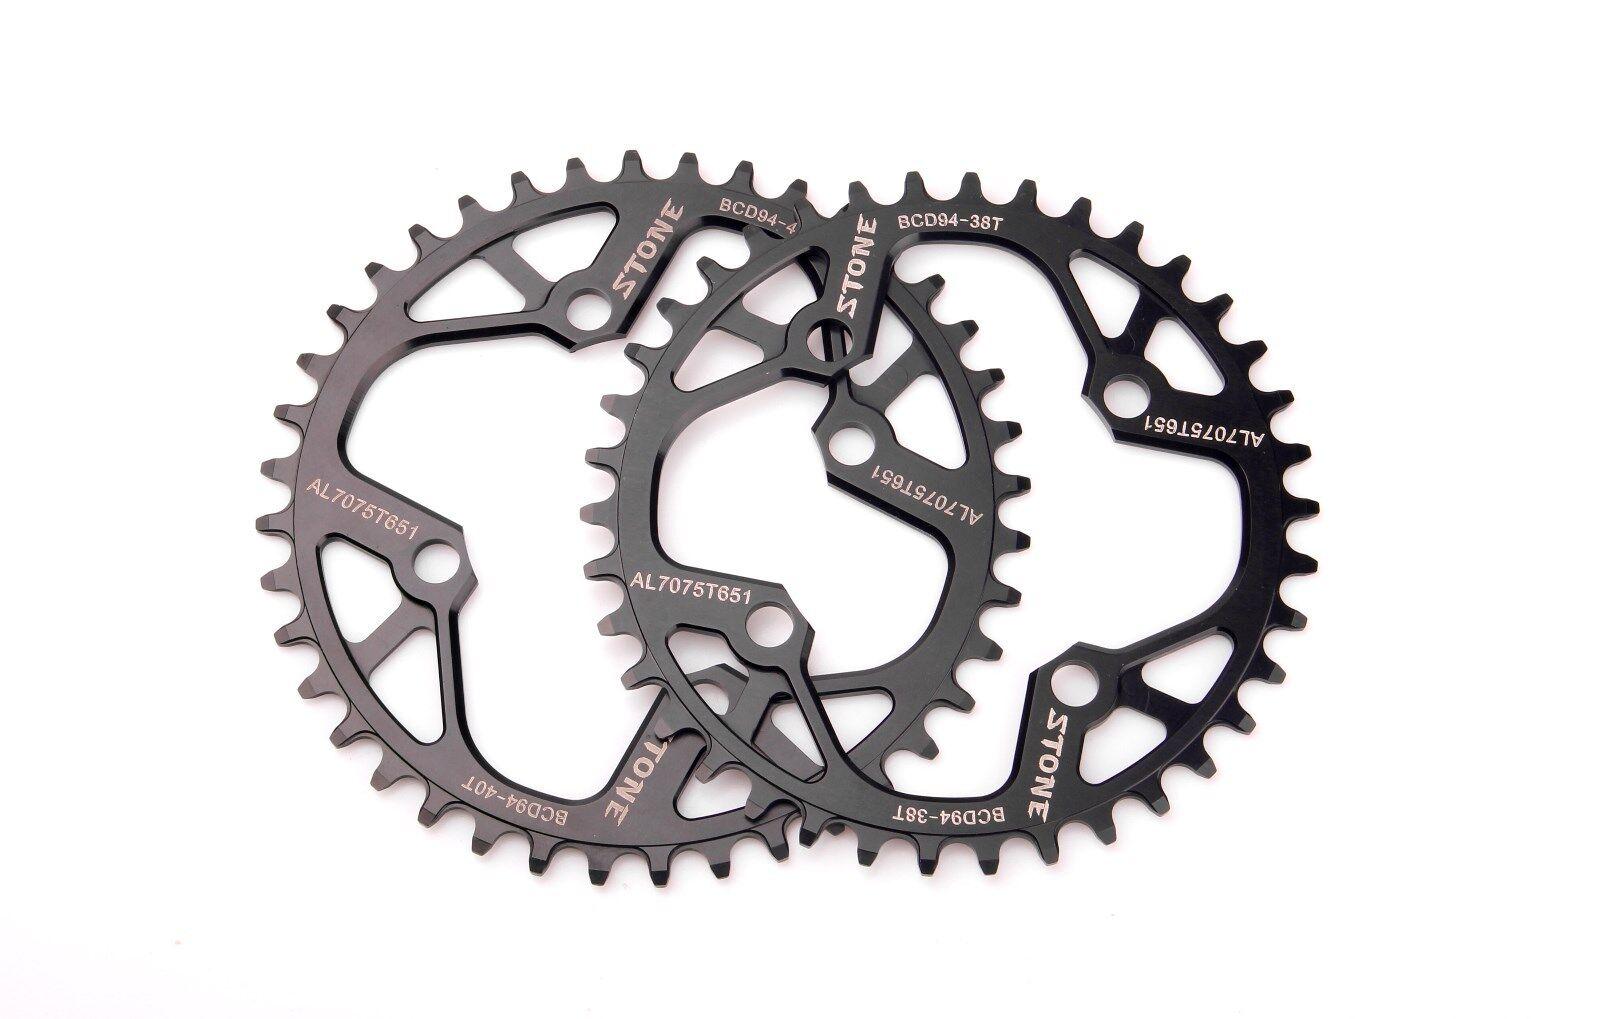 BCD94 Bicycle Chainring Narrow Wide NW teeth Circle for Sram  X1 NX GX94 FSA  healthy